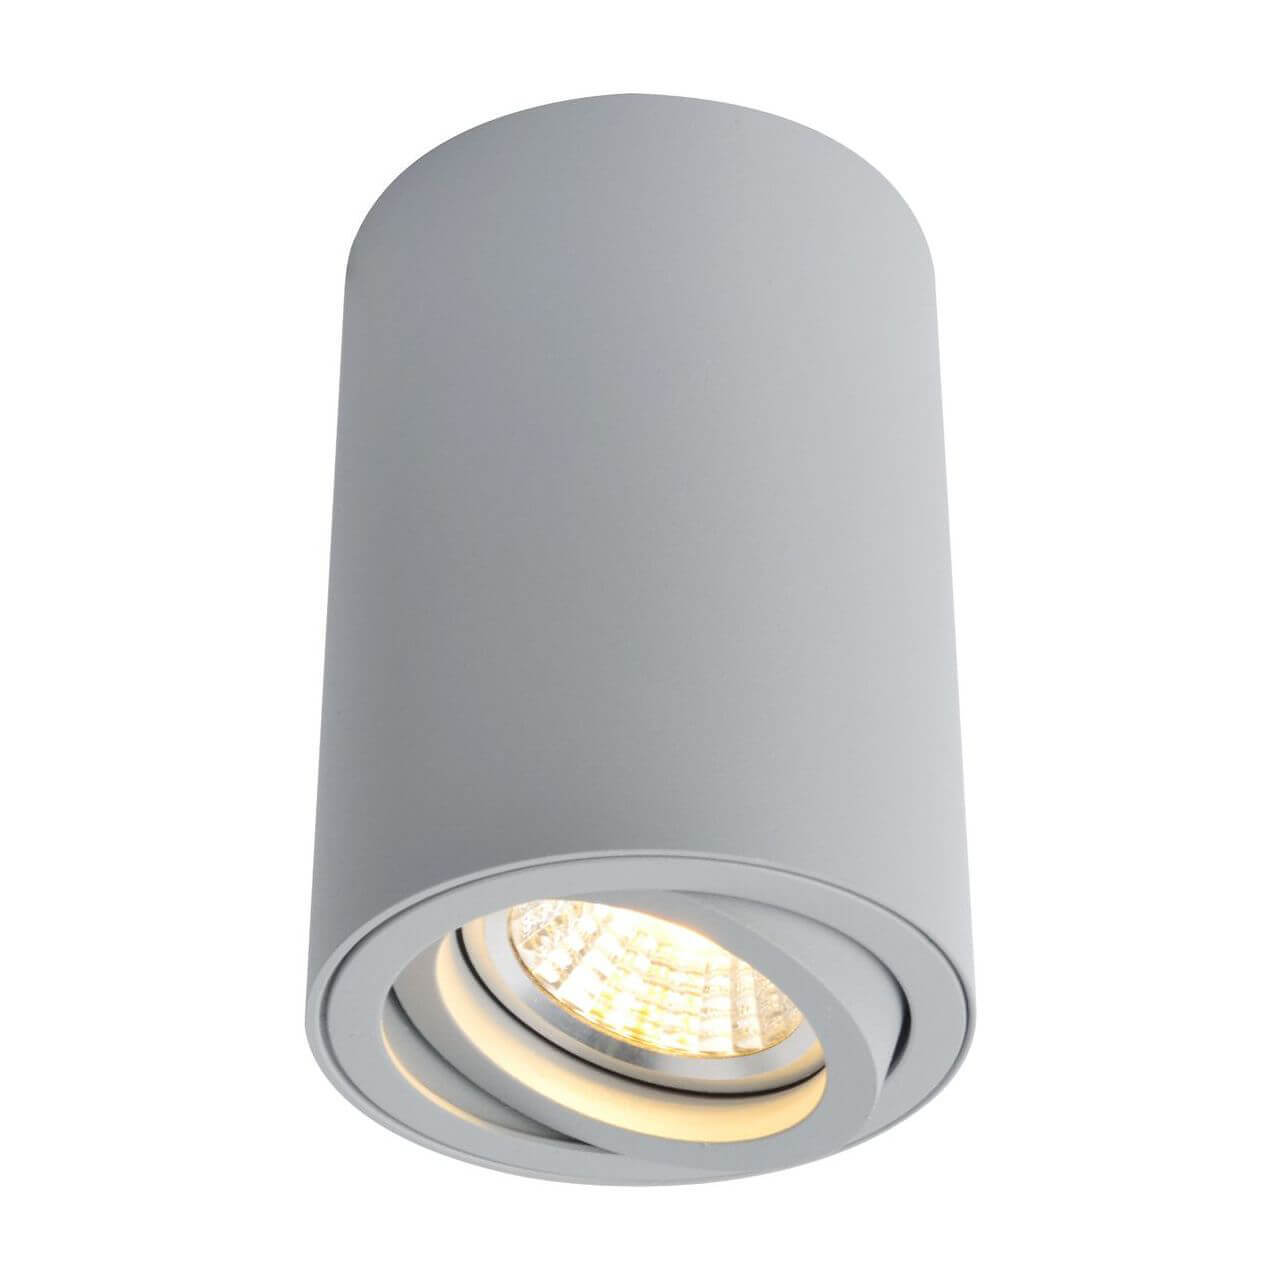 Светильник Arte Lamp A1560PL-1GY 1560